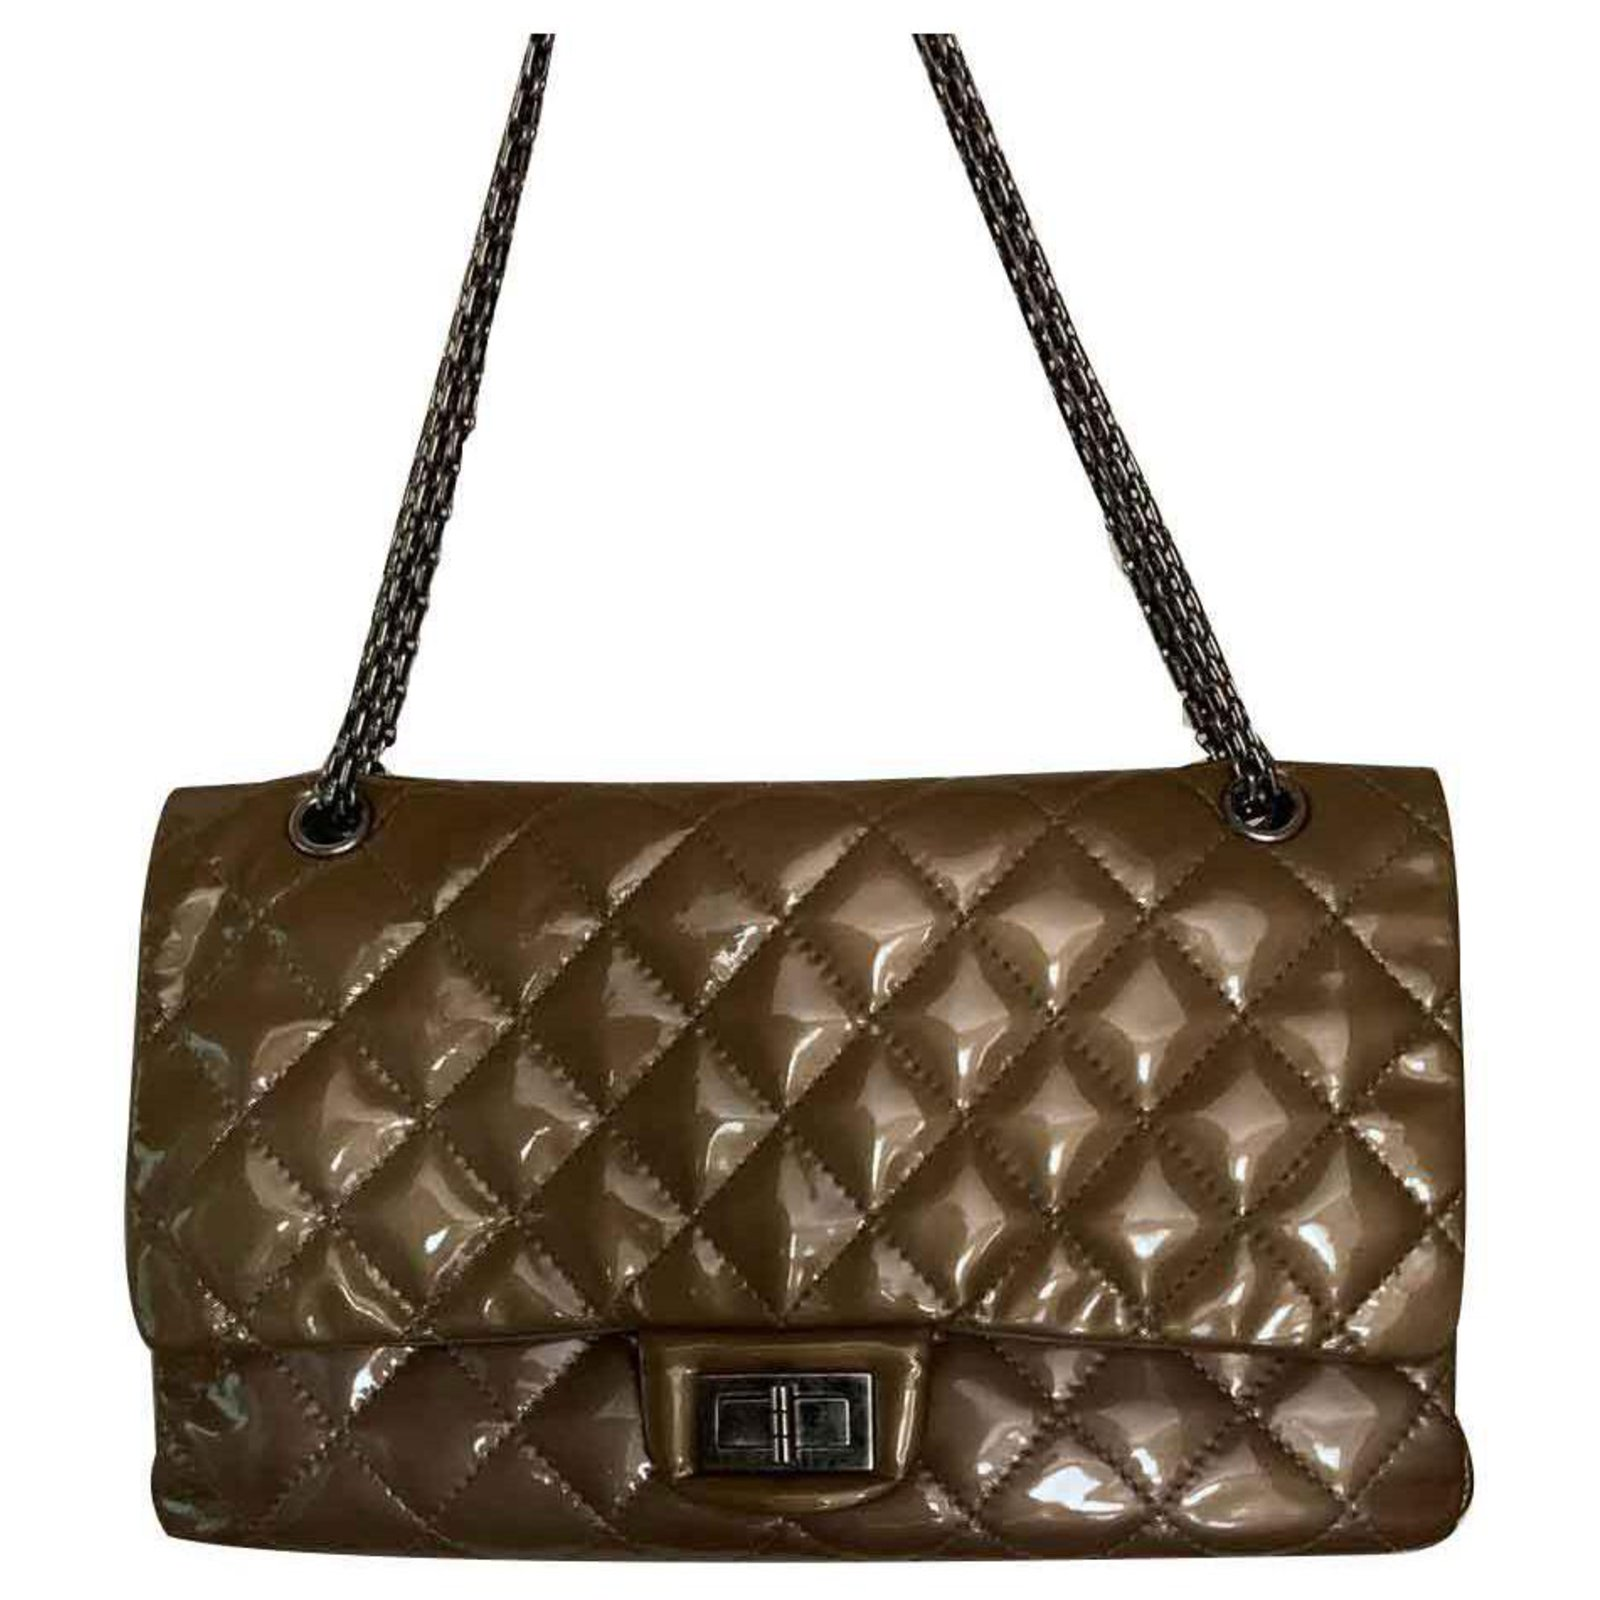 4b66e24e405bfa Chanel Reissue 2.55 Handbags Patent leather Beige ref.123189 - Joli Closet